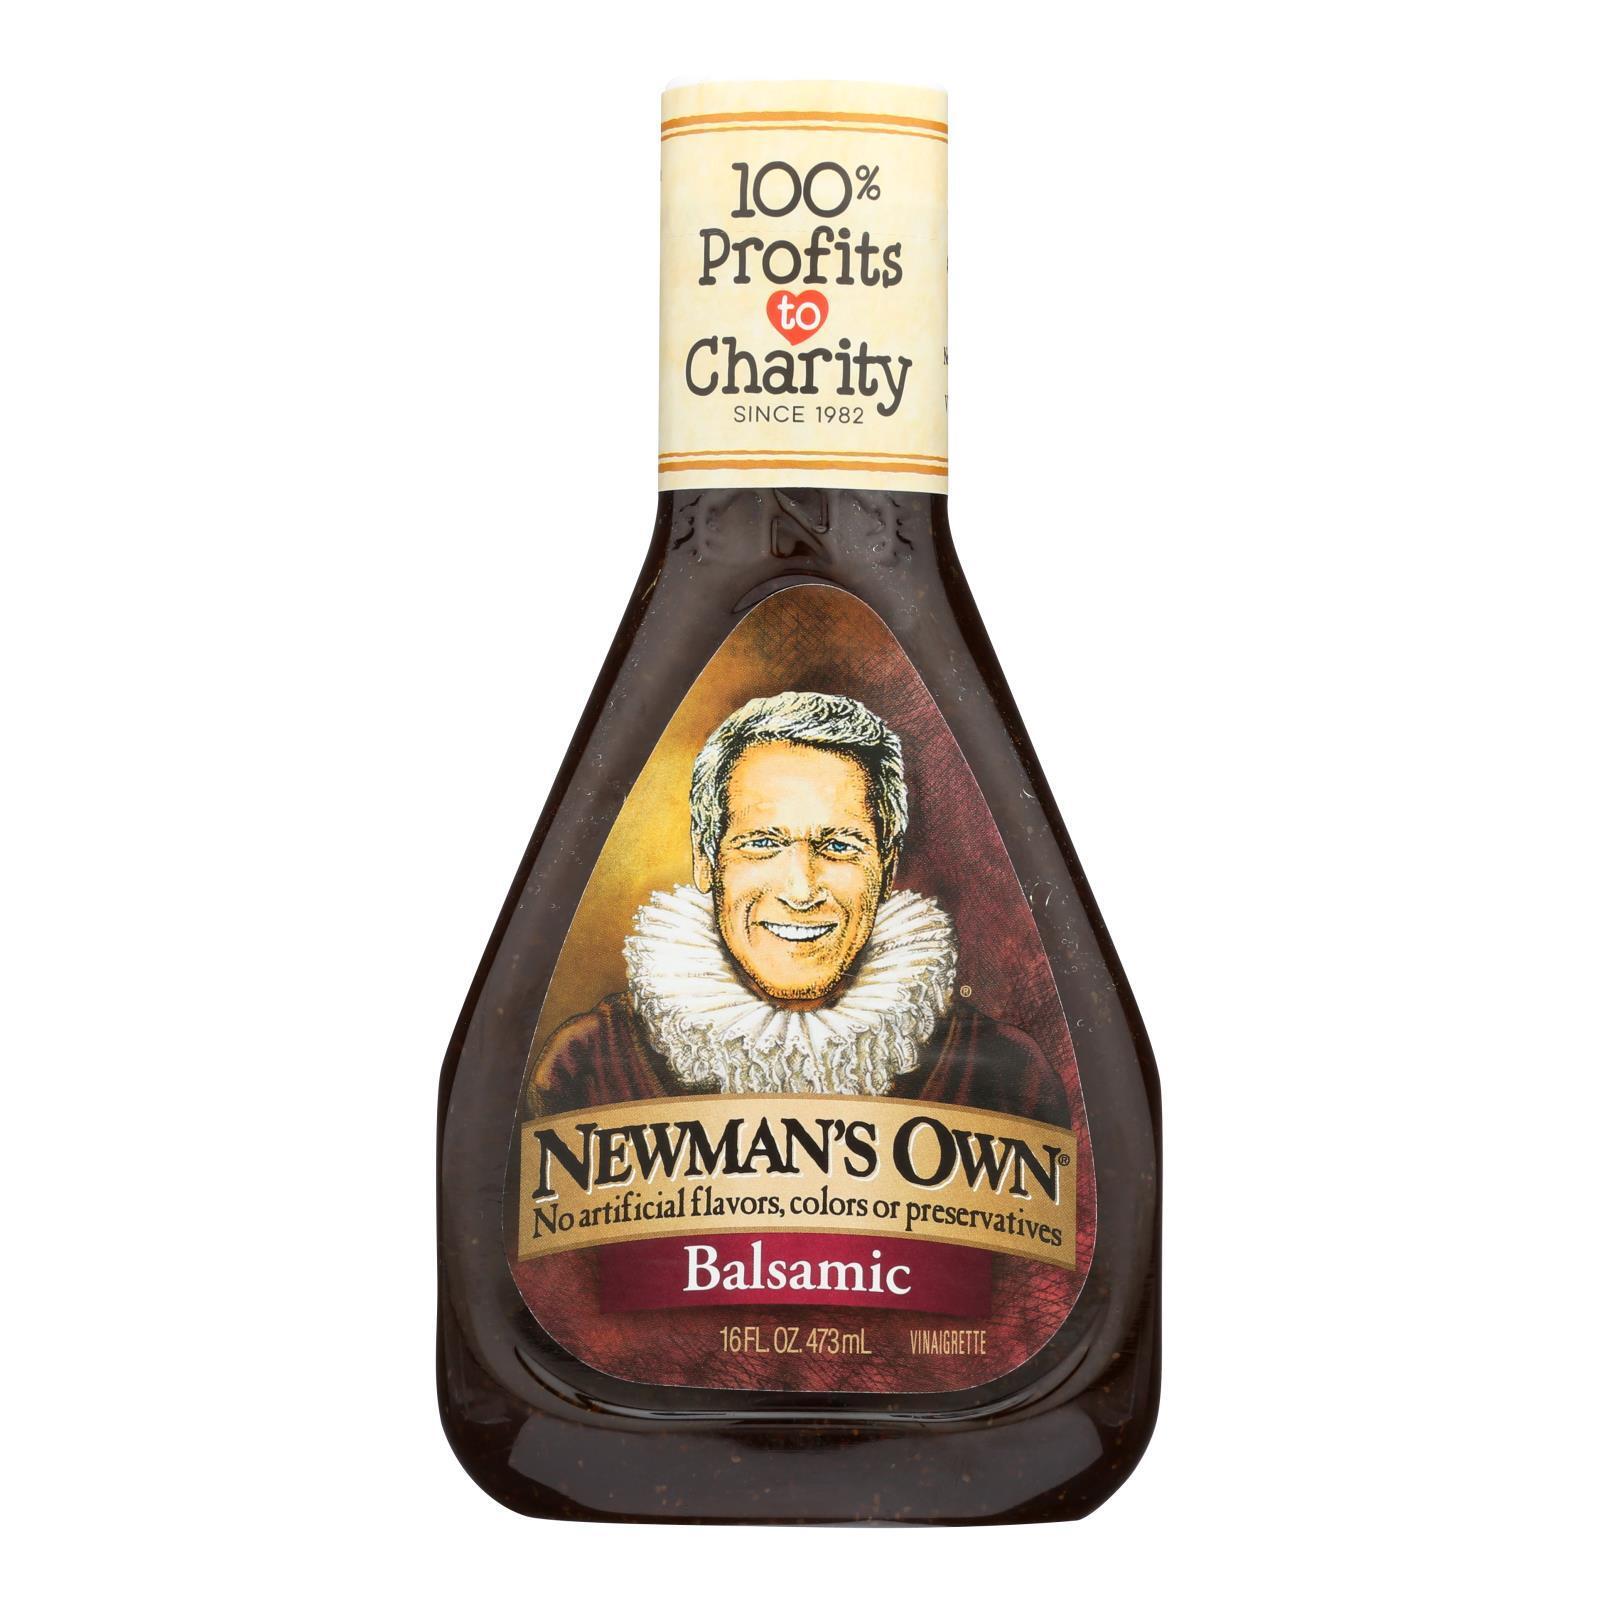 Newman's Own Balsamic Salad Dressing - Vinegar - Case of 6 - 16 Fl oz.